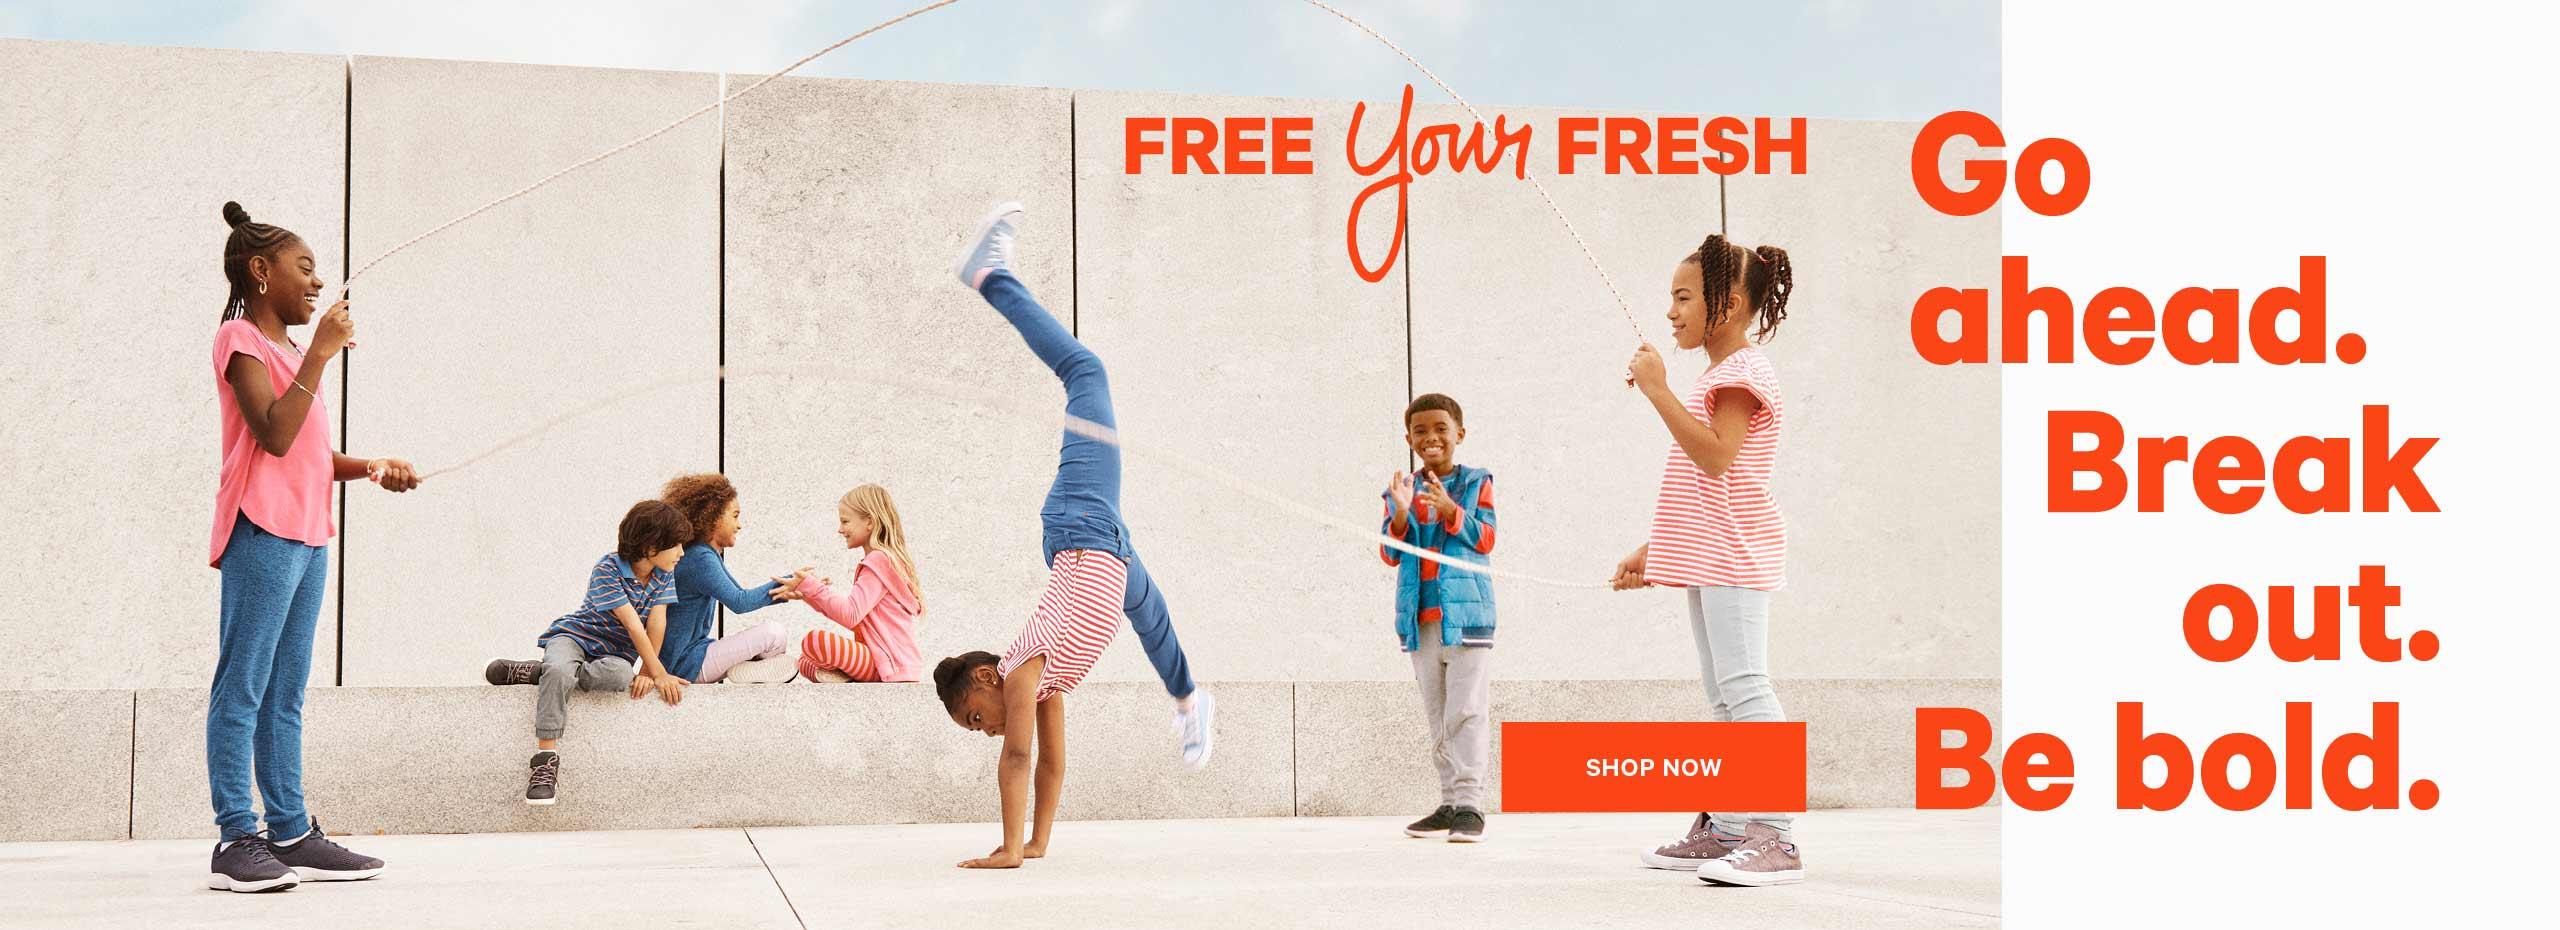 Joe Fresh: Stylish Women's, Men's, & Kids' Clothing